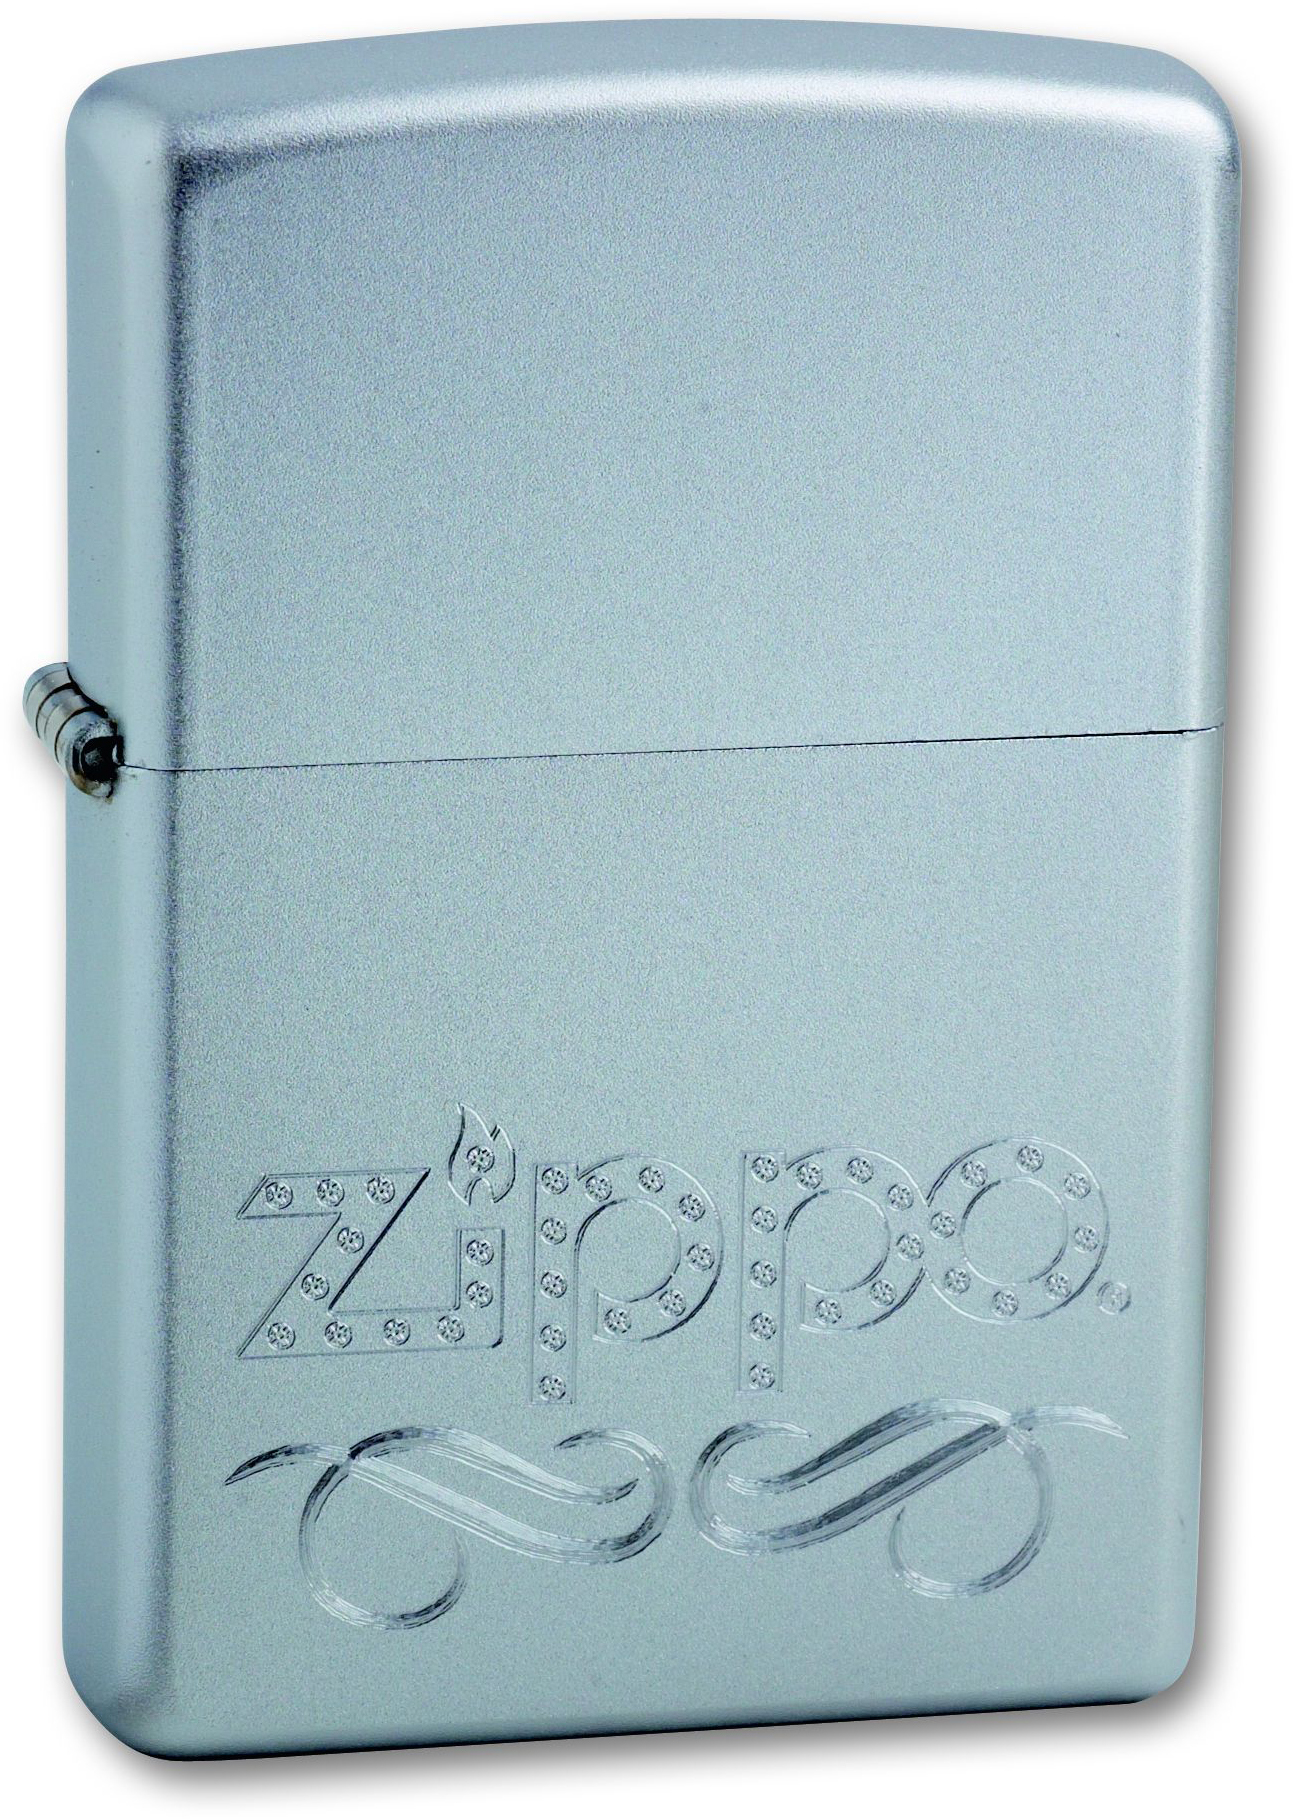 Зажигалка ZIPPO Zippo Scroll Satin Chrome, латунь с ник.-хром. покрыт.,серебр.,матовая, 36х56х12 ммЗажигалки Zippo<br>Зажигалка ZIPPO Zippo Scroll Satin Chrome, латунь с никеле-хромовым покрытием, серебряный, матовая, 36х56х12 мм<br>